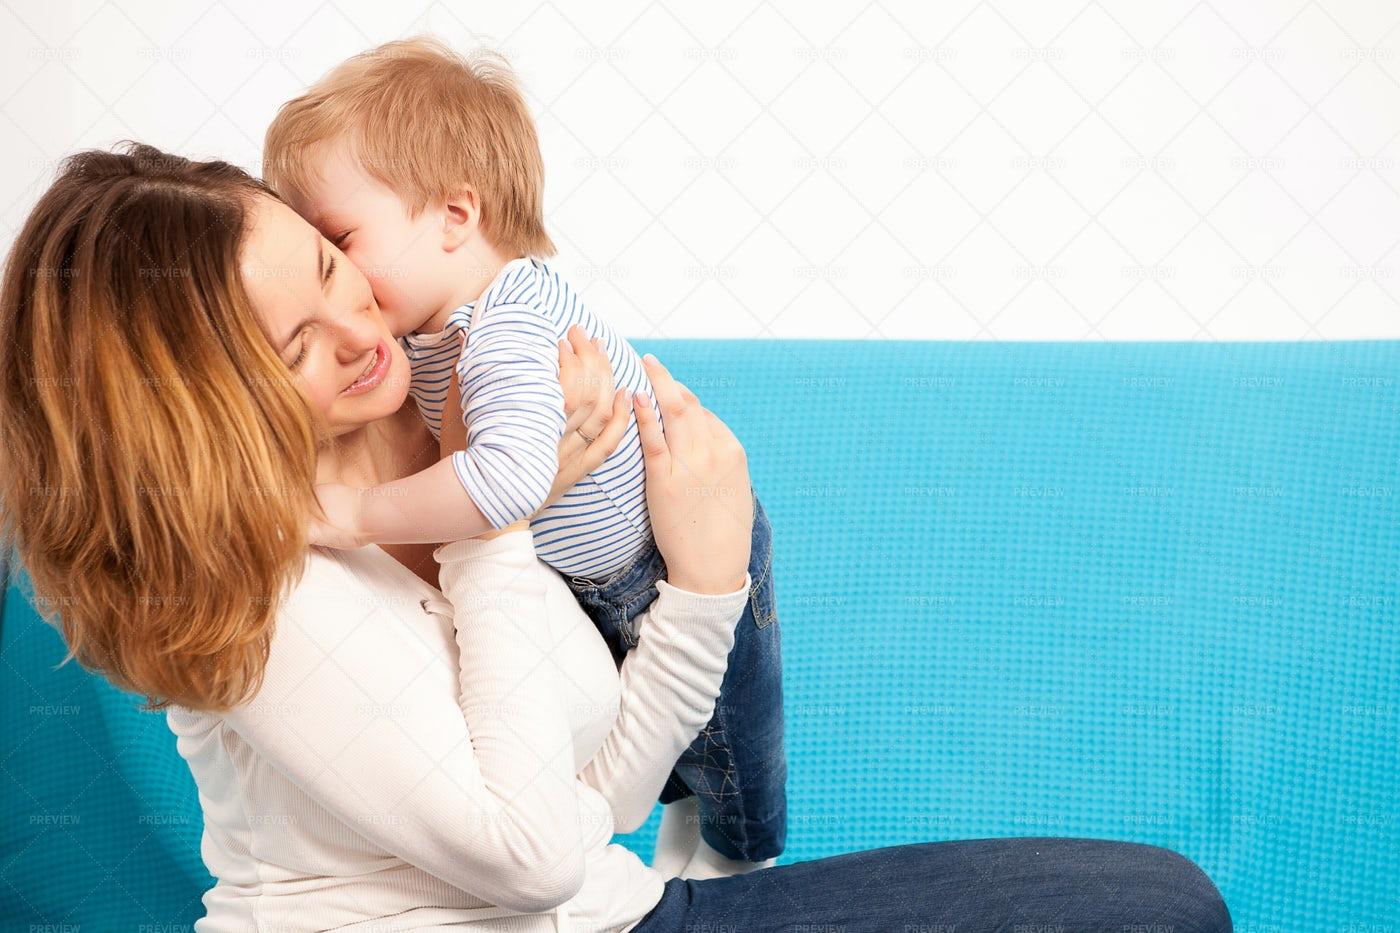 Baby Boy Kissing Mother: Stock Photos